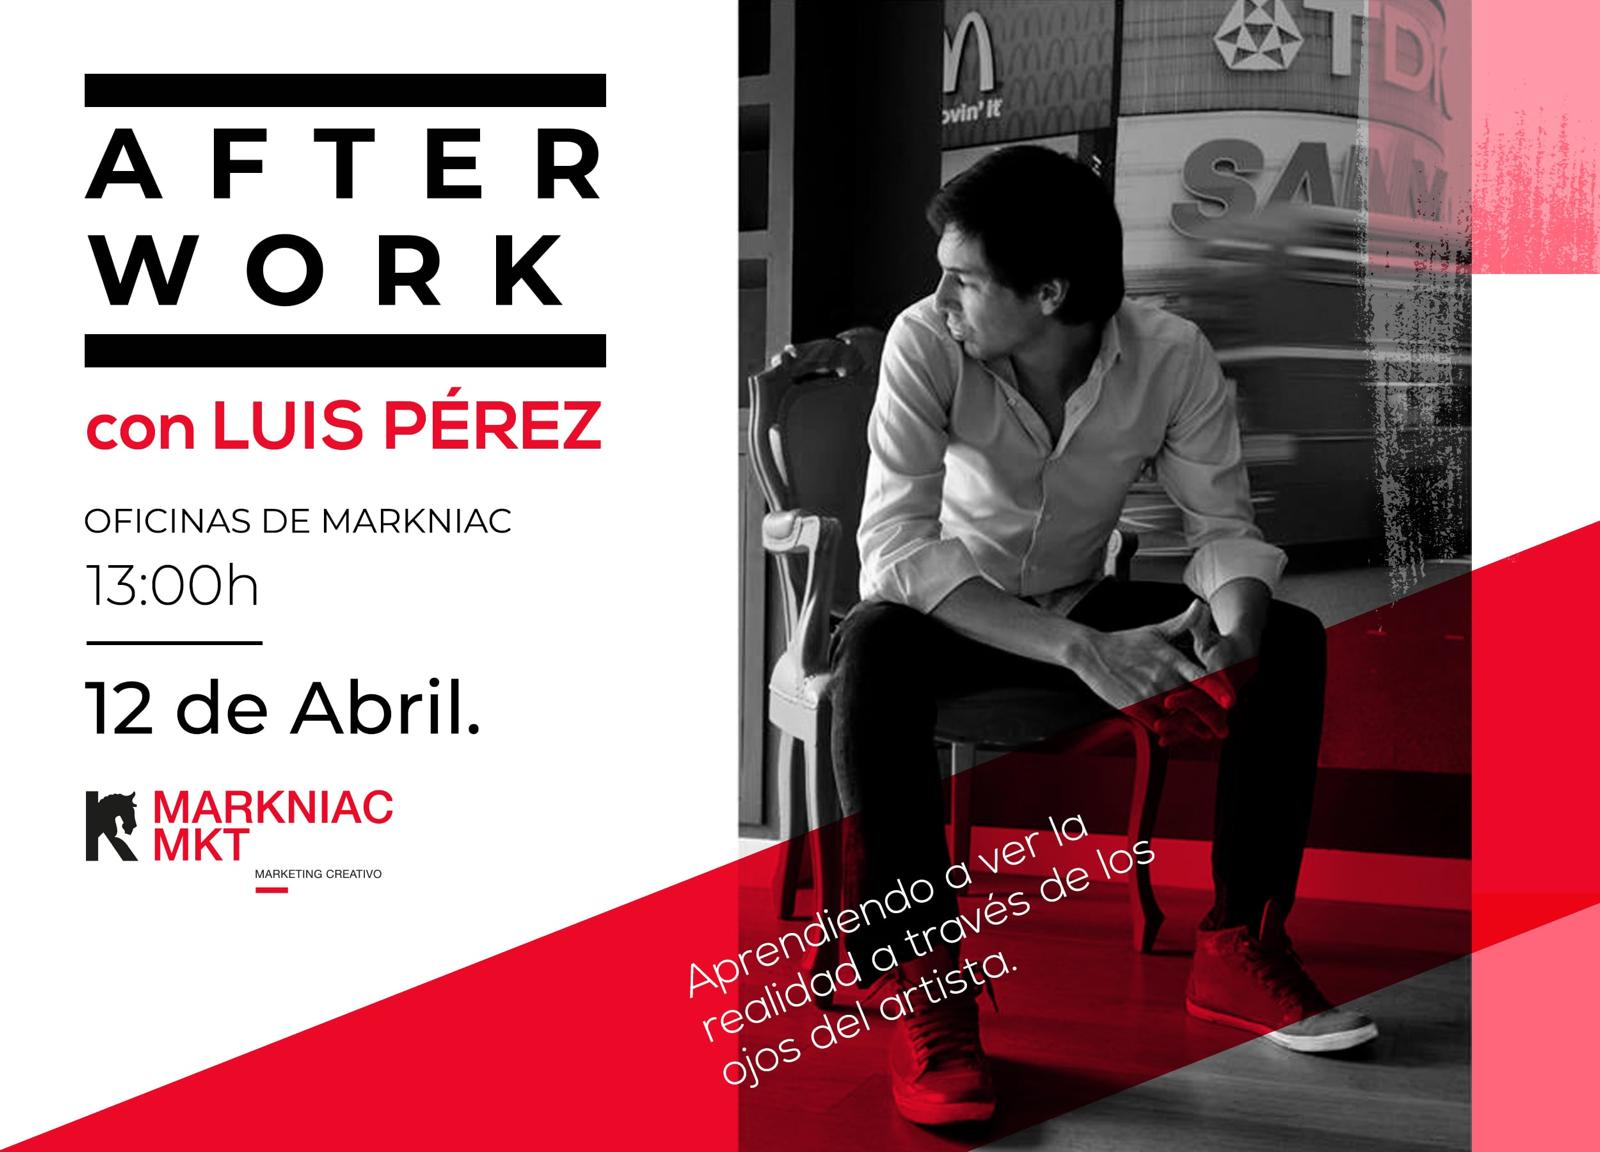 Luis Pérez<br><em>Pintor y fotógrafo internacional</em>